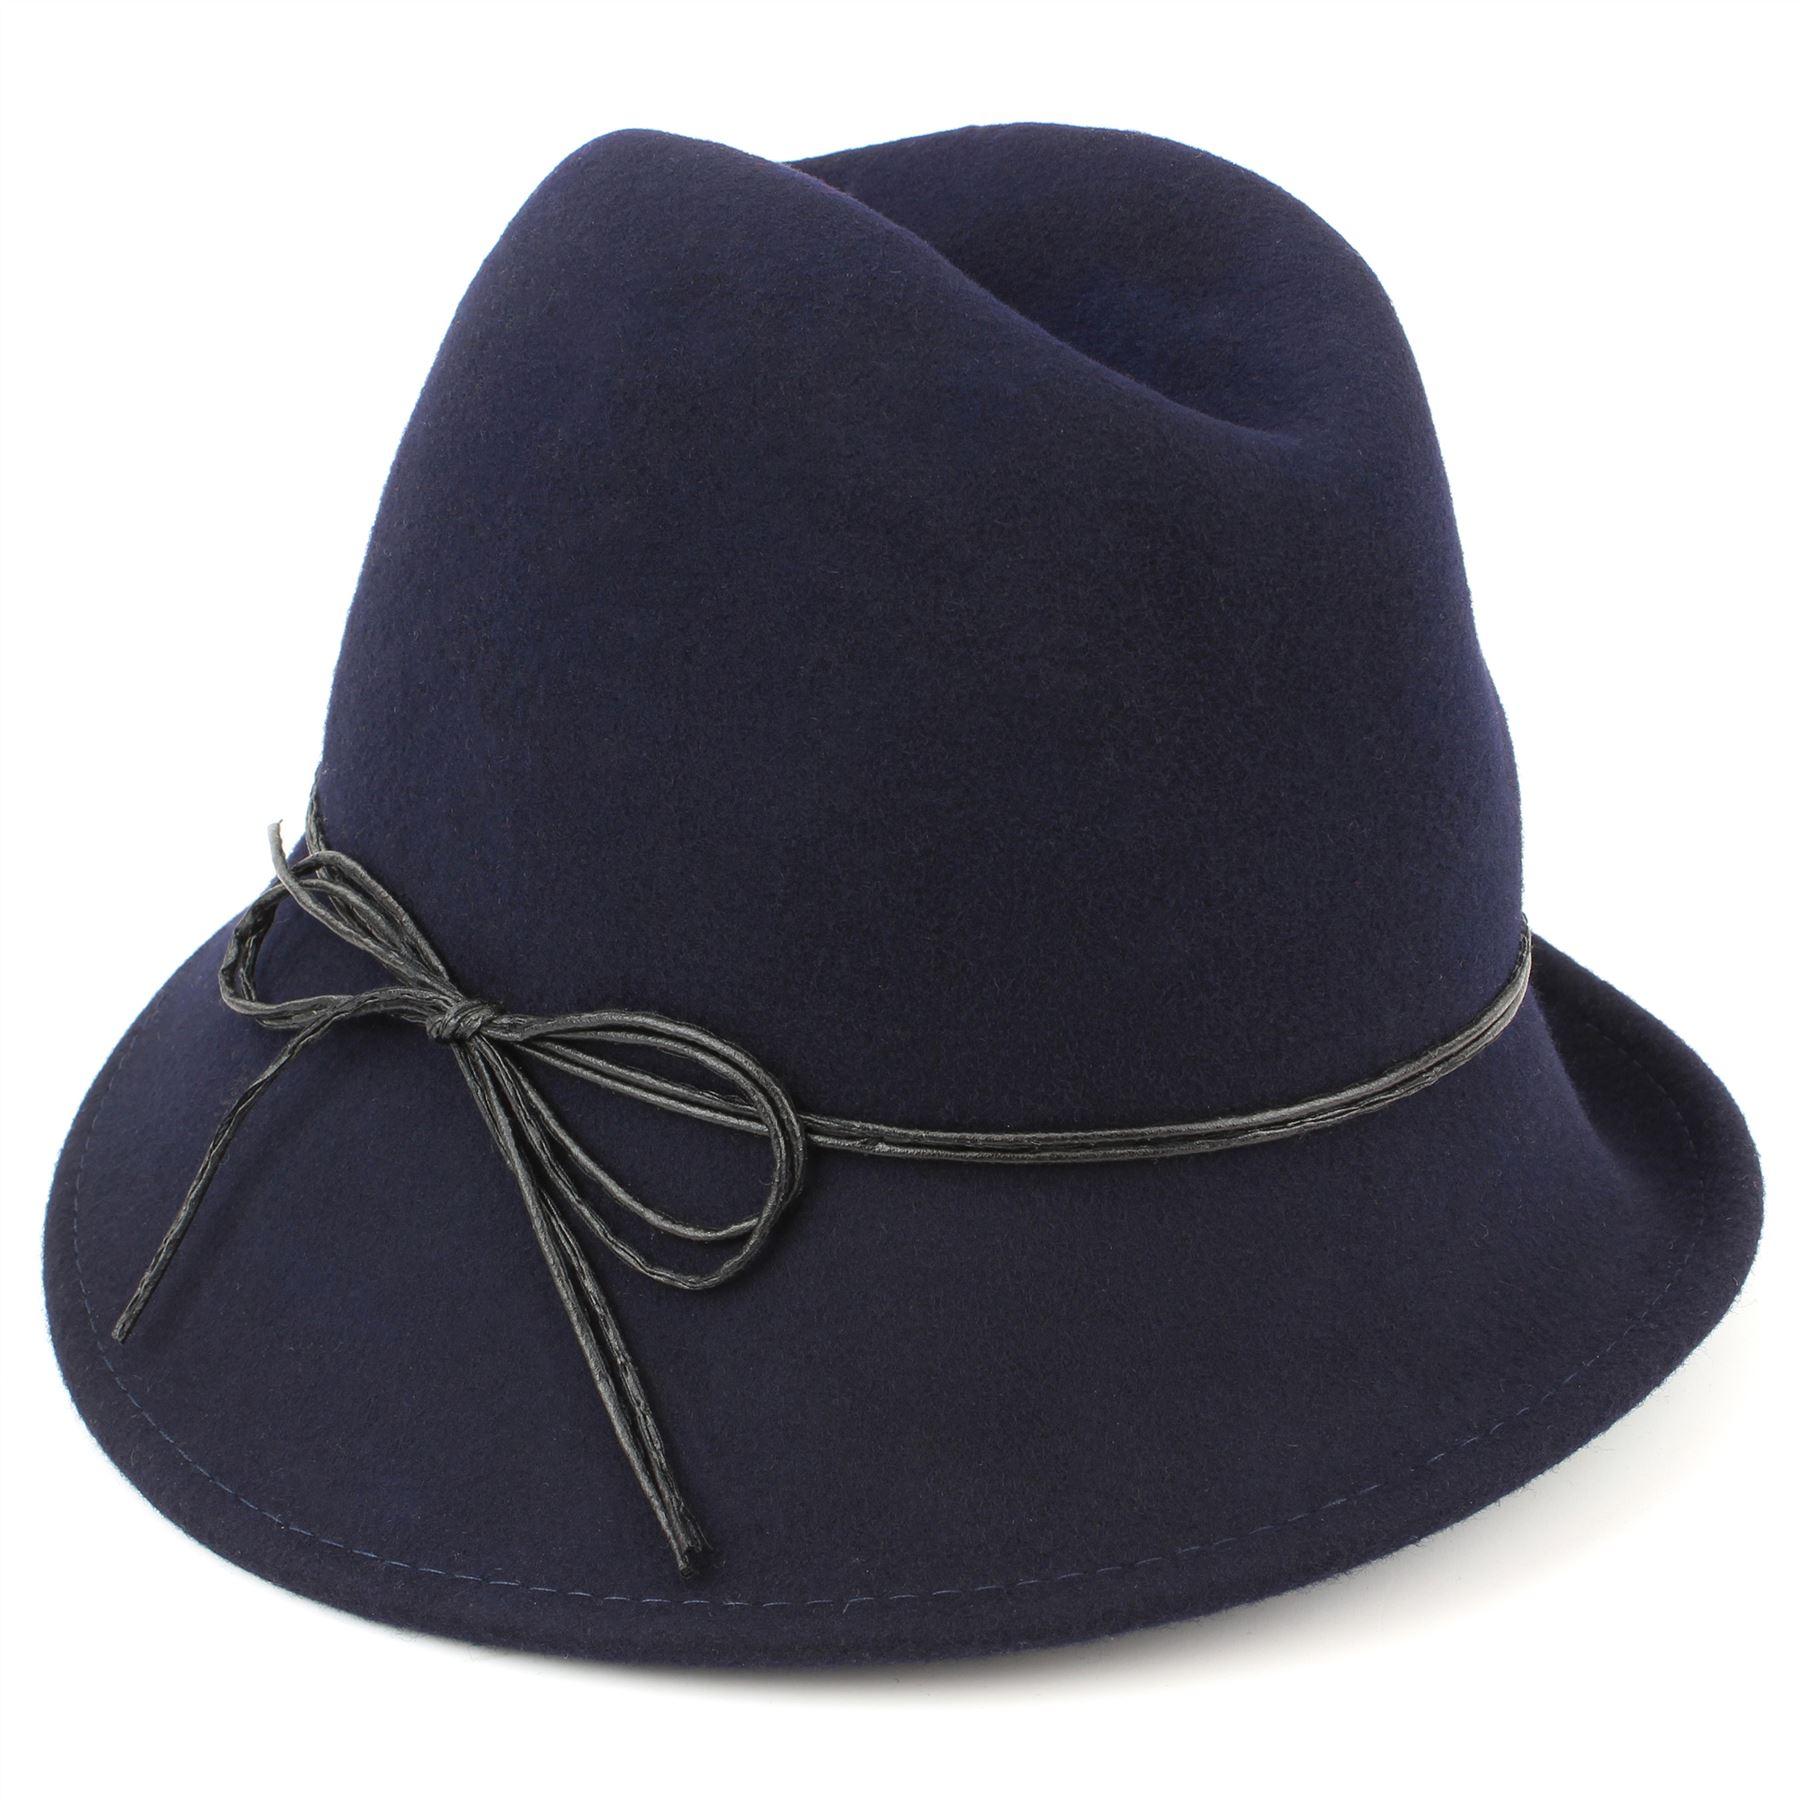 wool trilby hat felt womens hawkins cloche vintage cap